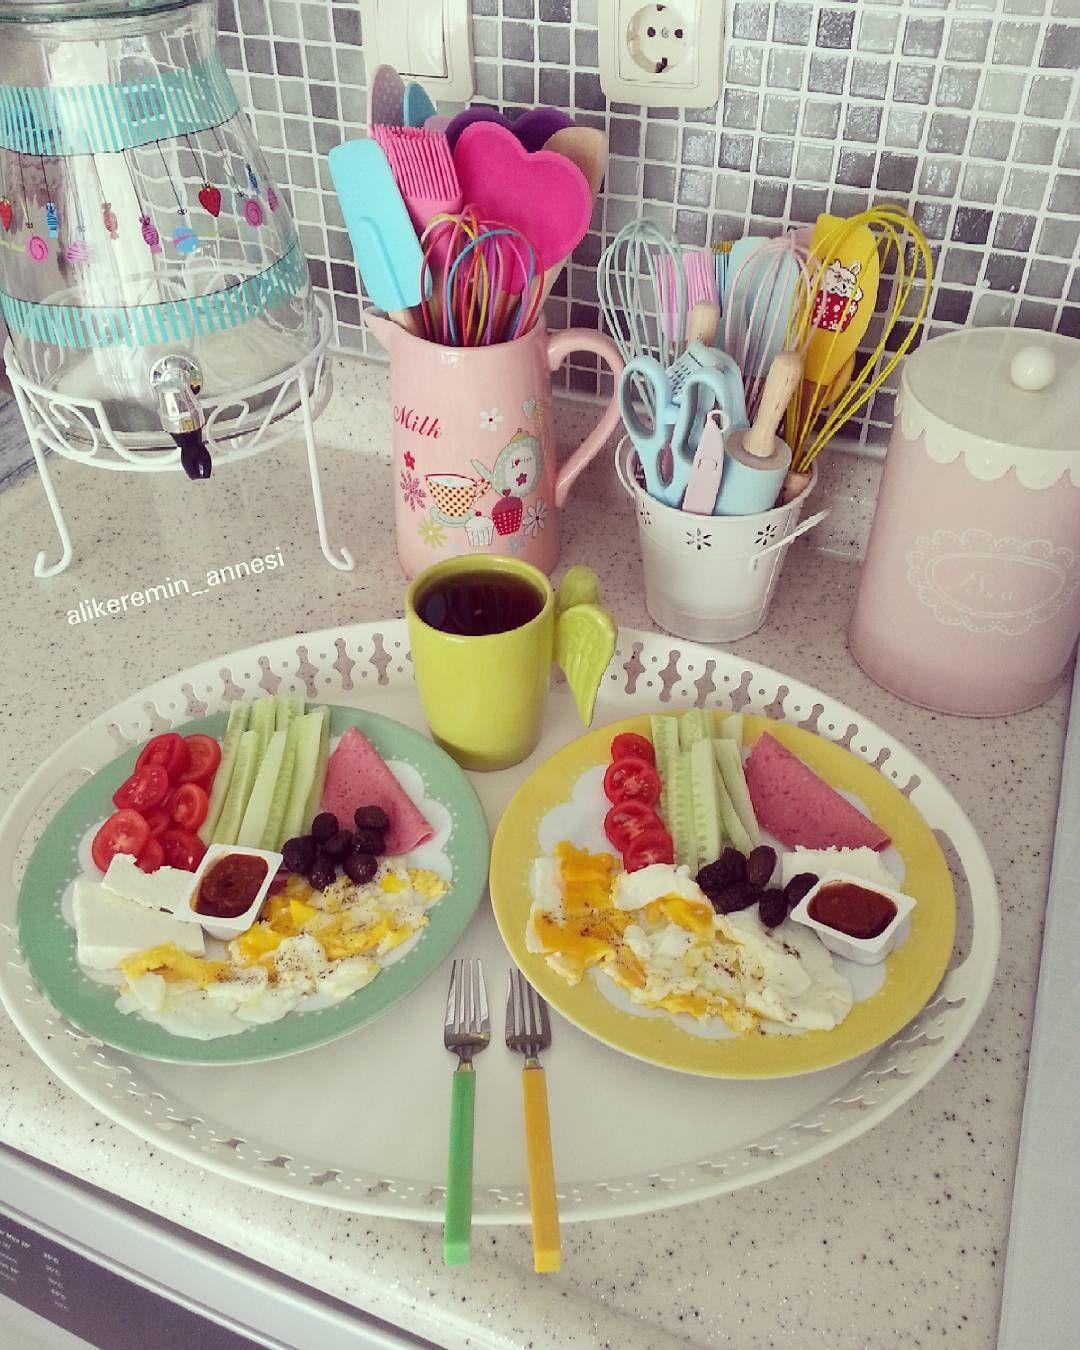 Rangement Petit Dejeuner Cuisine günaydın #pasamla#kahvaltikeyfimiz #tantitoni#arahome